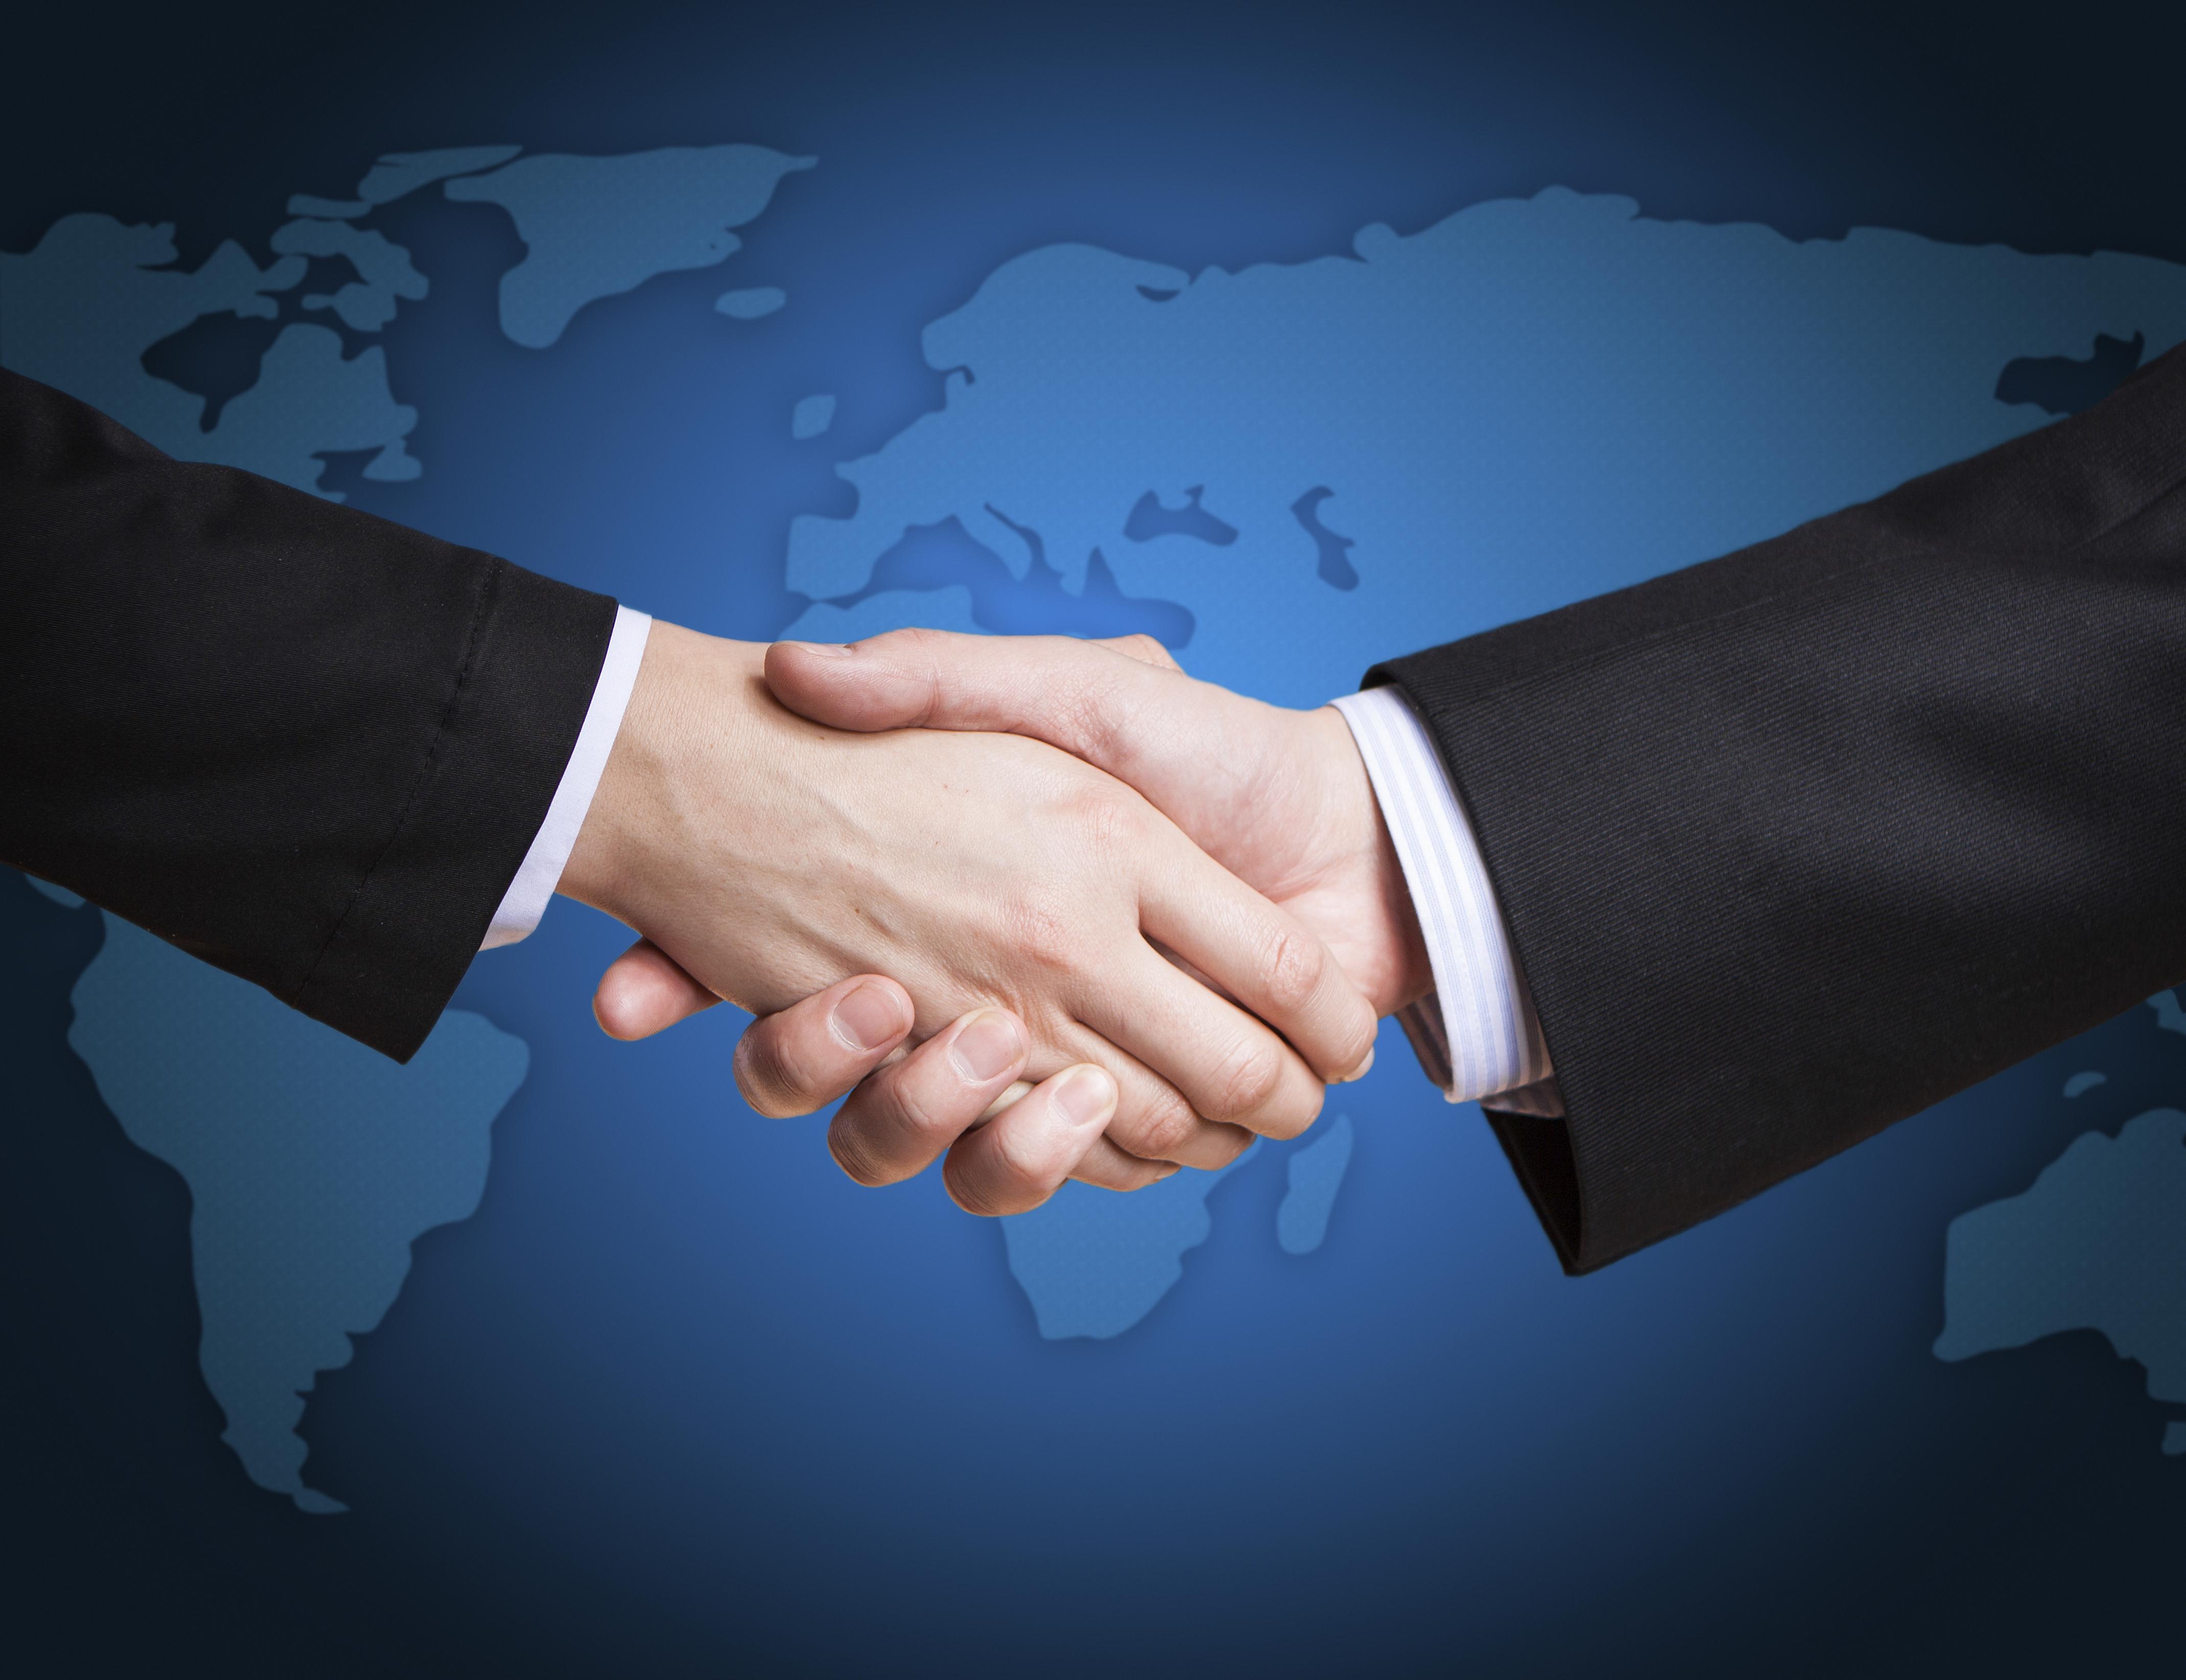 Handshake Business Global Trade Review Gtr